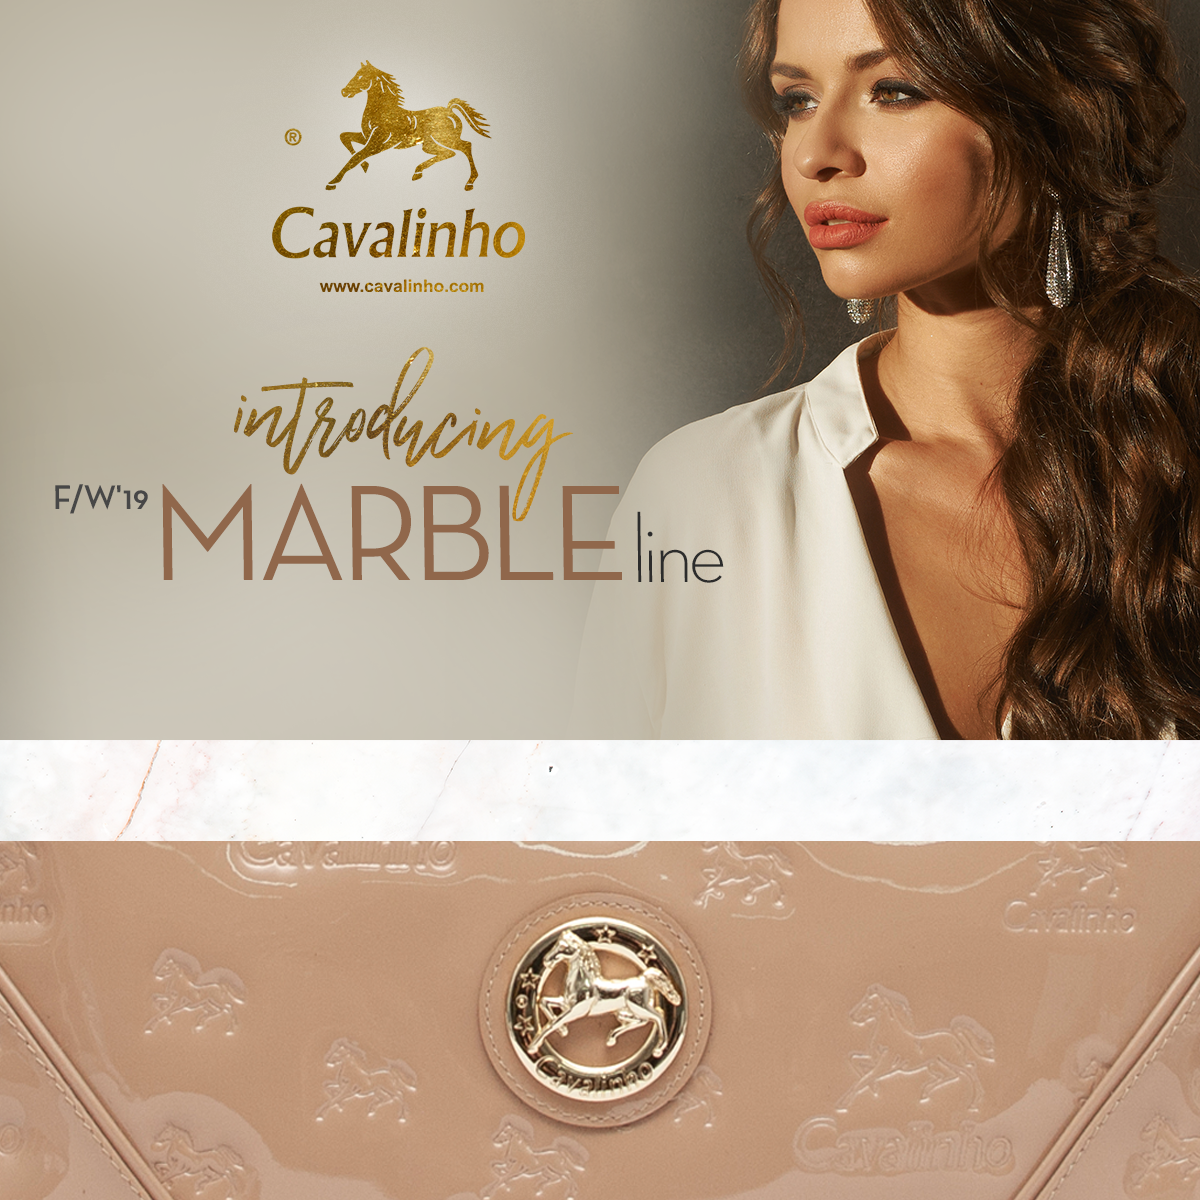 52_marbleline_01